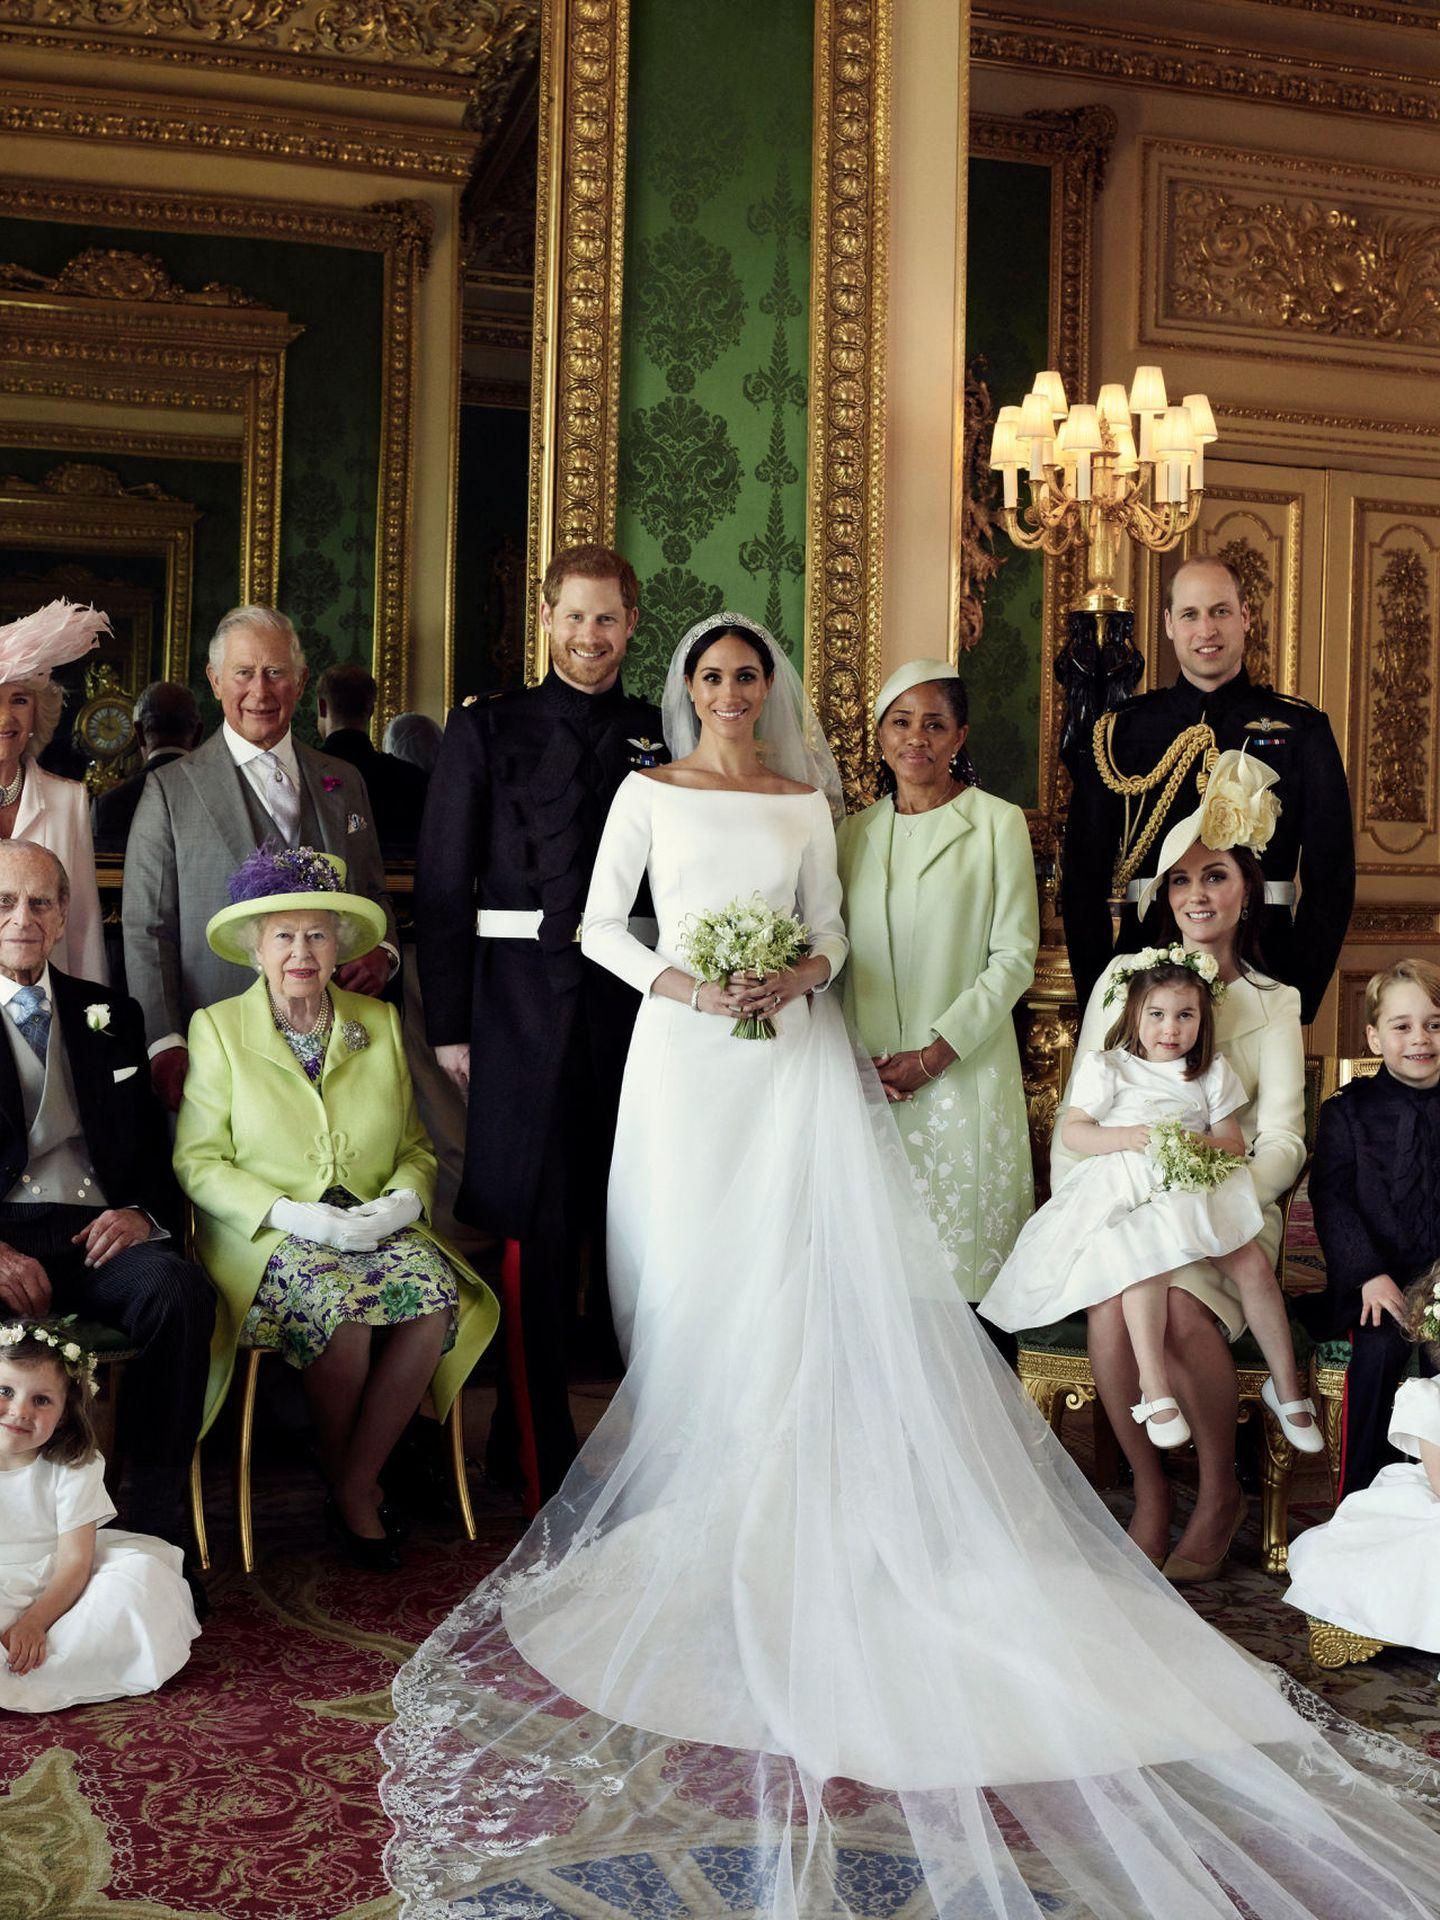 La boda de los duques de Sussex. (Reuters)